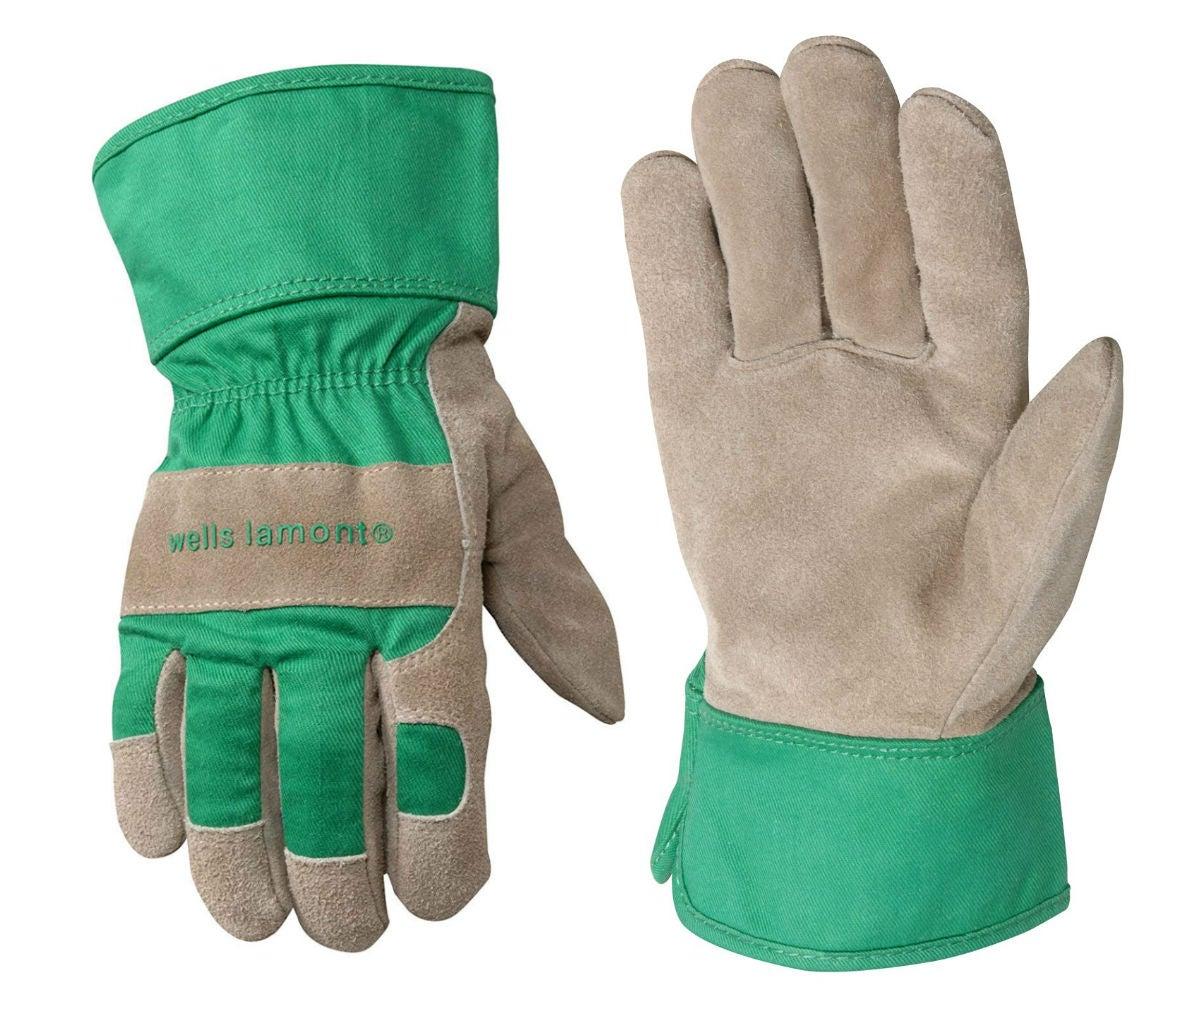 The Best Gardening Gloves: Wells Lamont